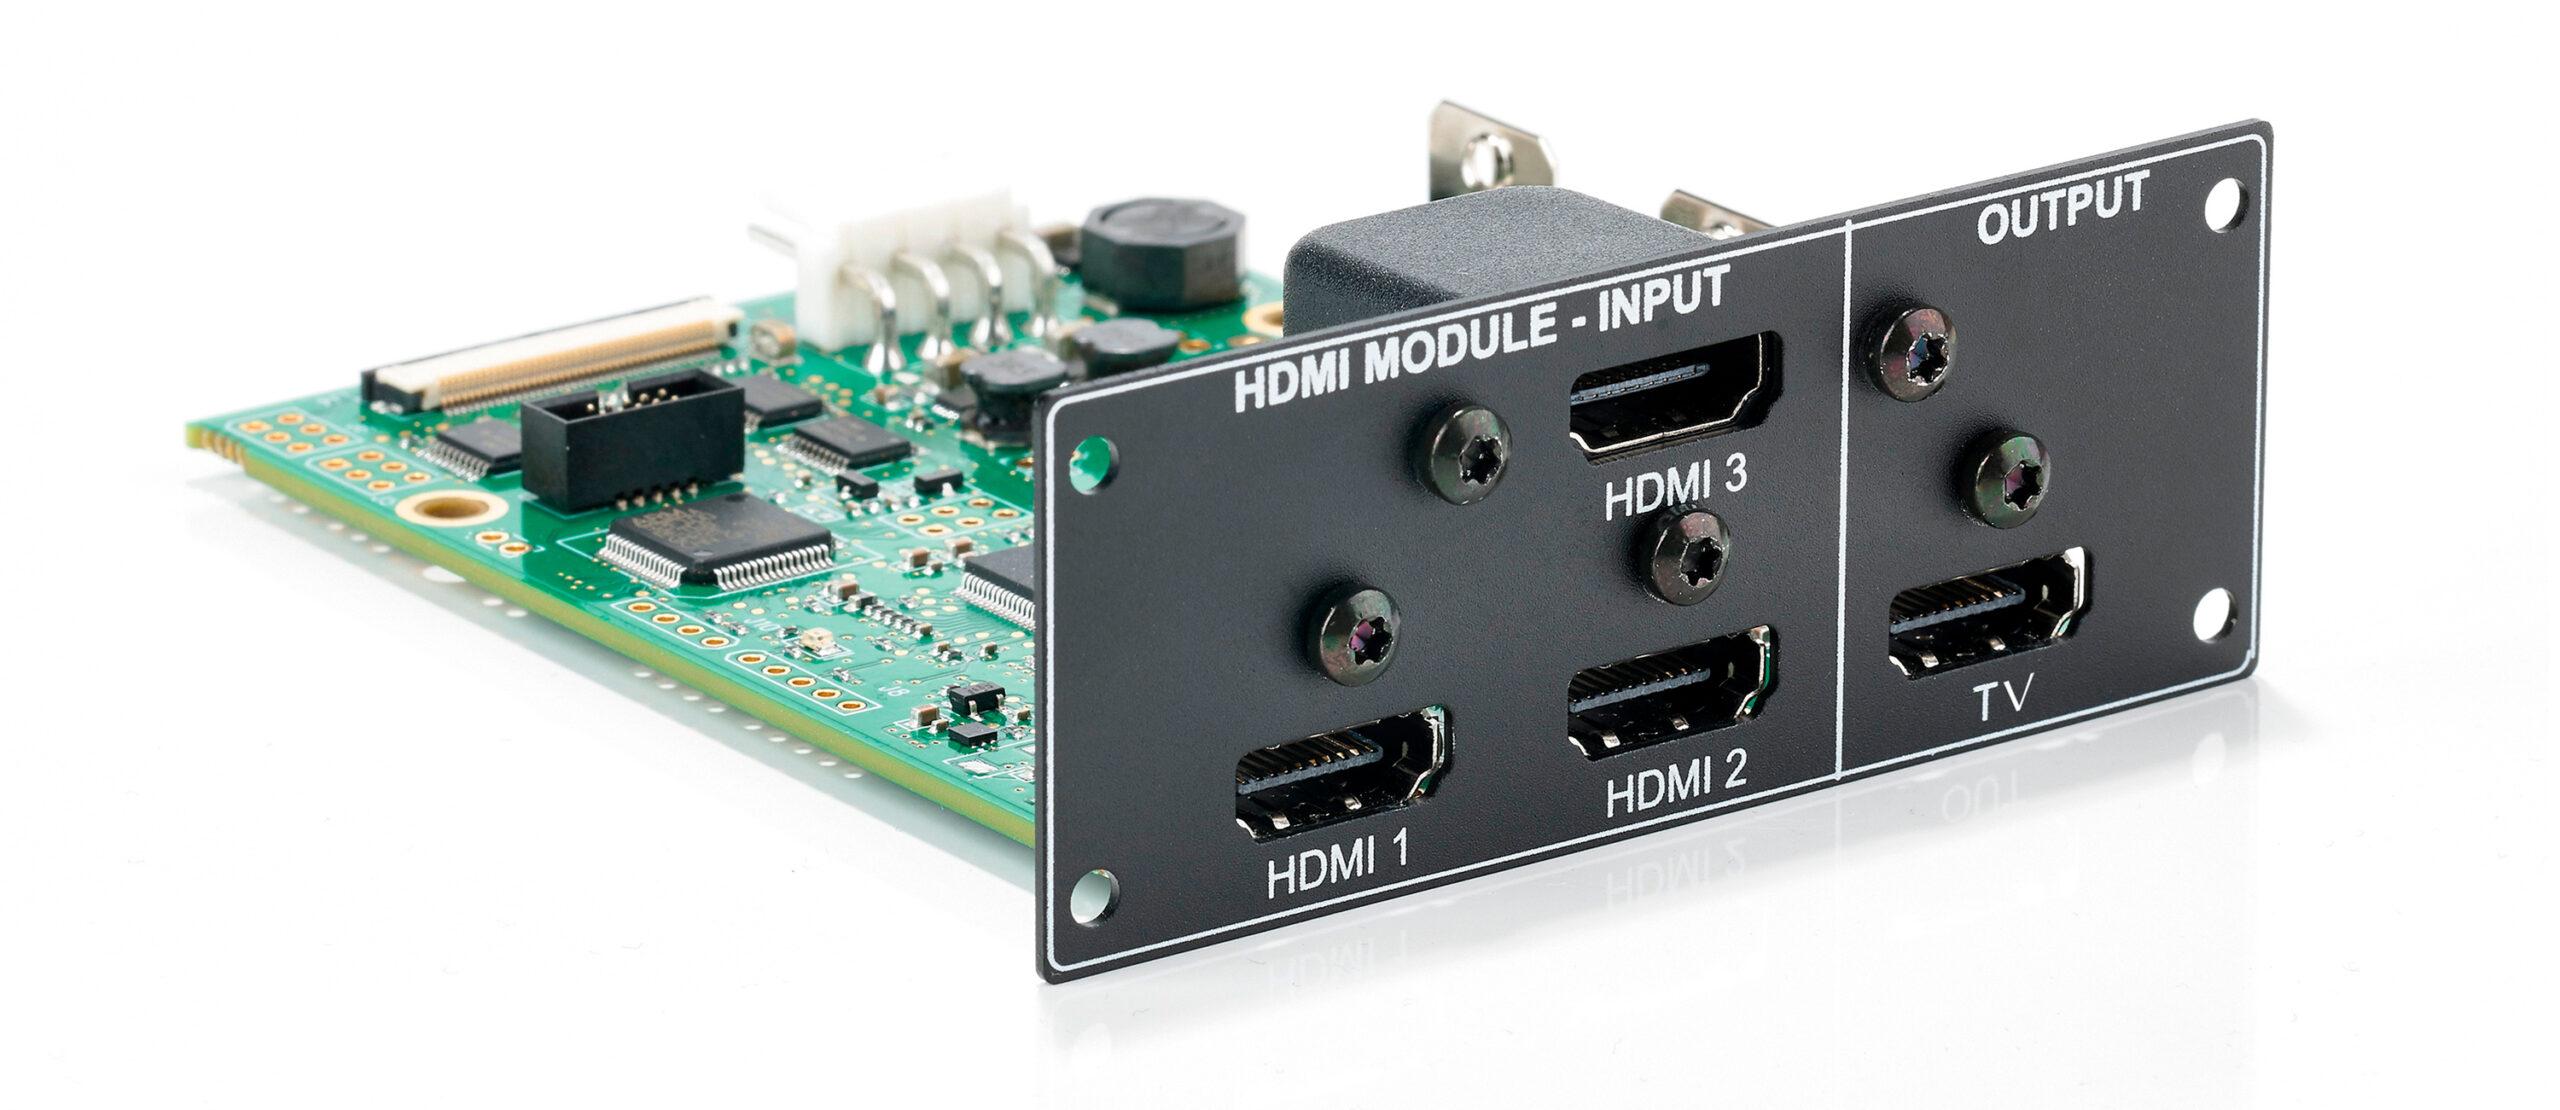 New HDMI module